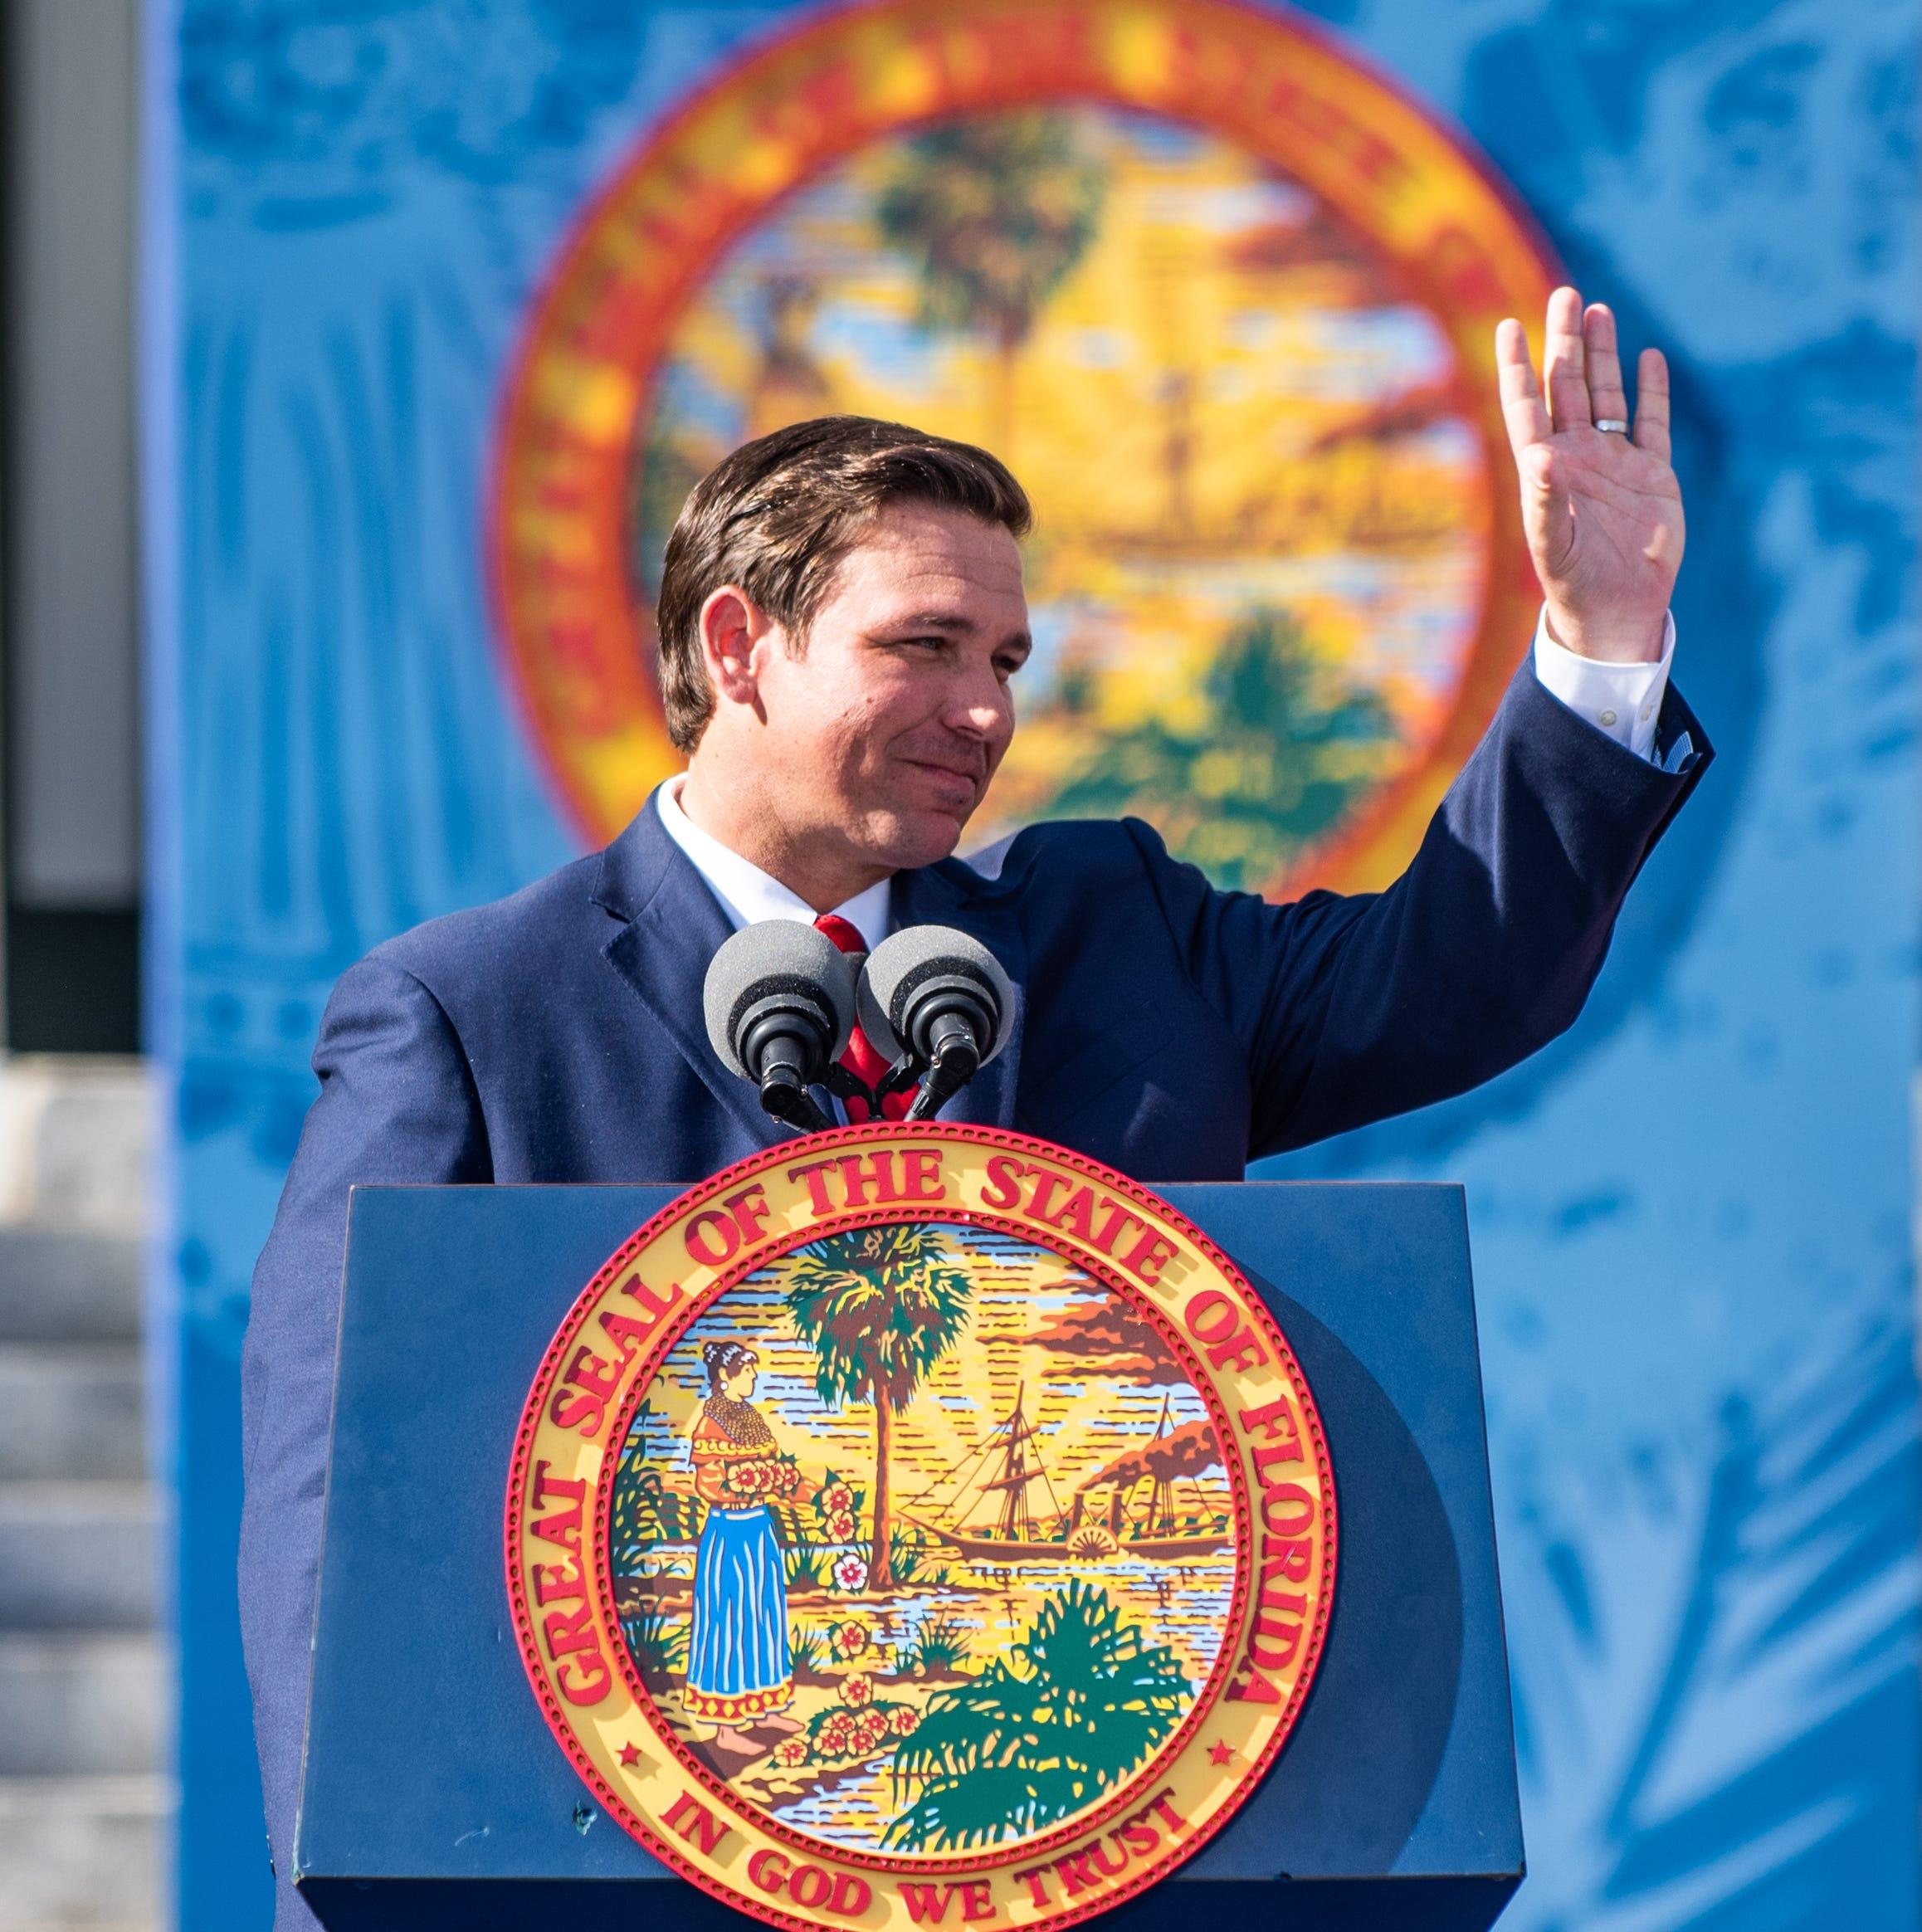 Ron DeSantis officially takes office as Florida's governor